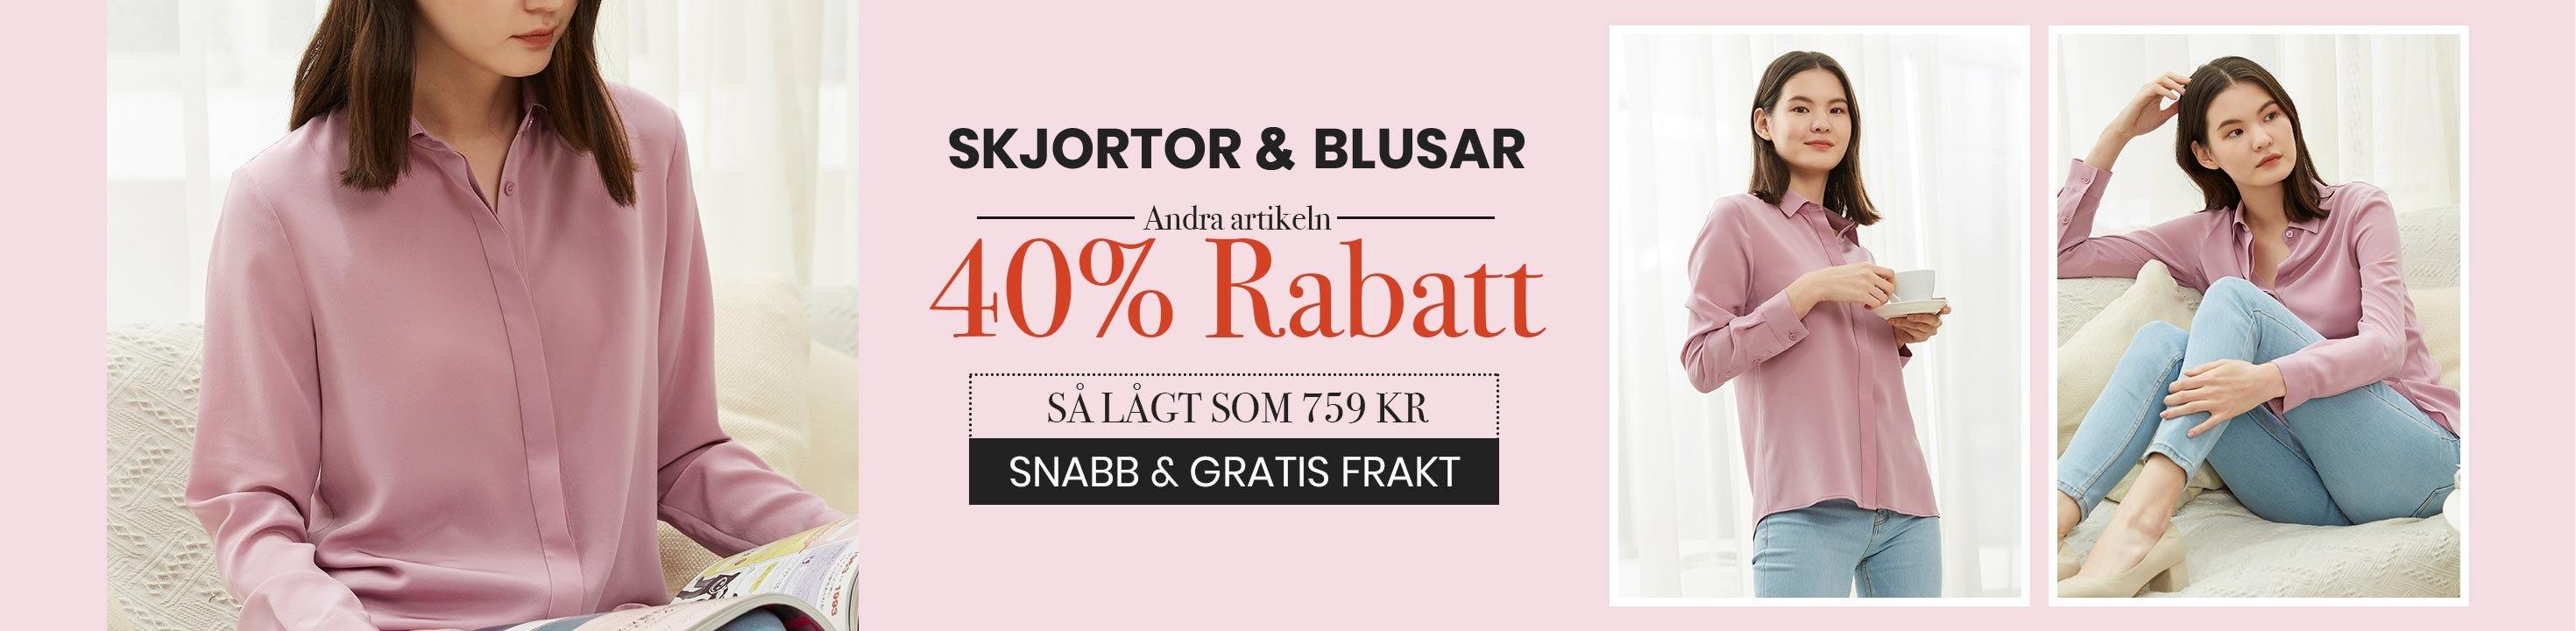 Skjortor & Blusar